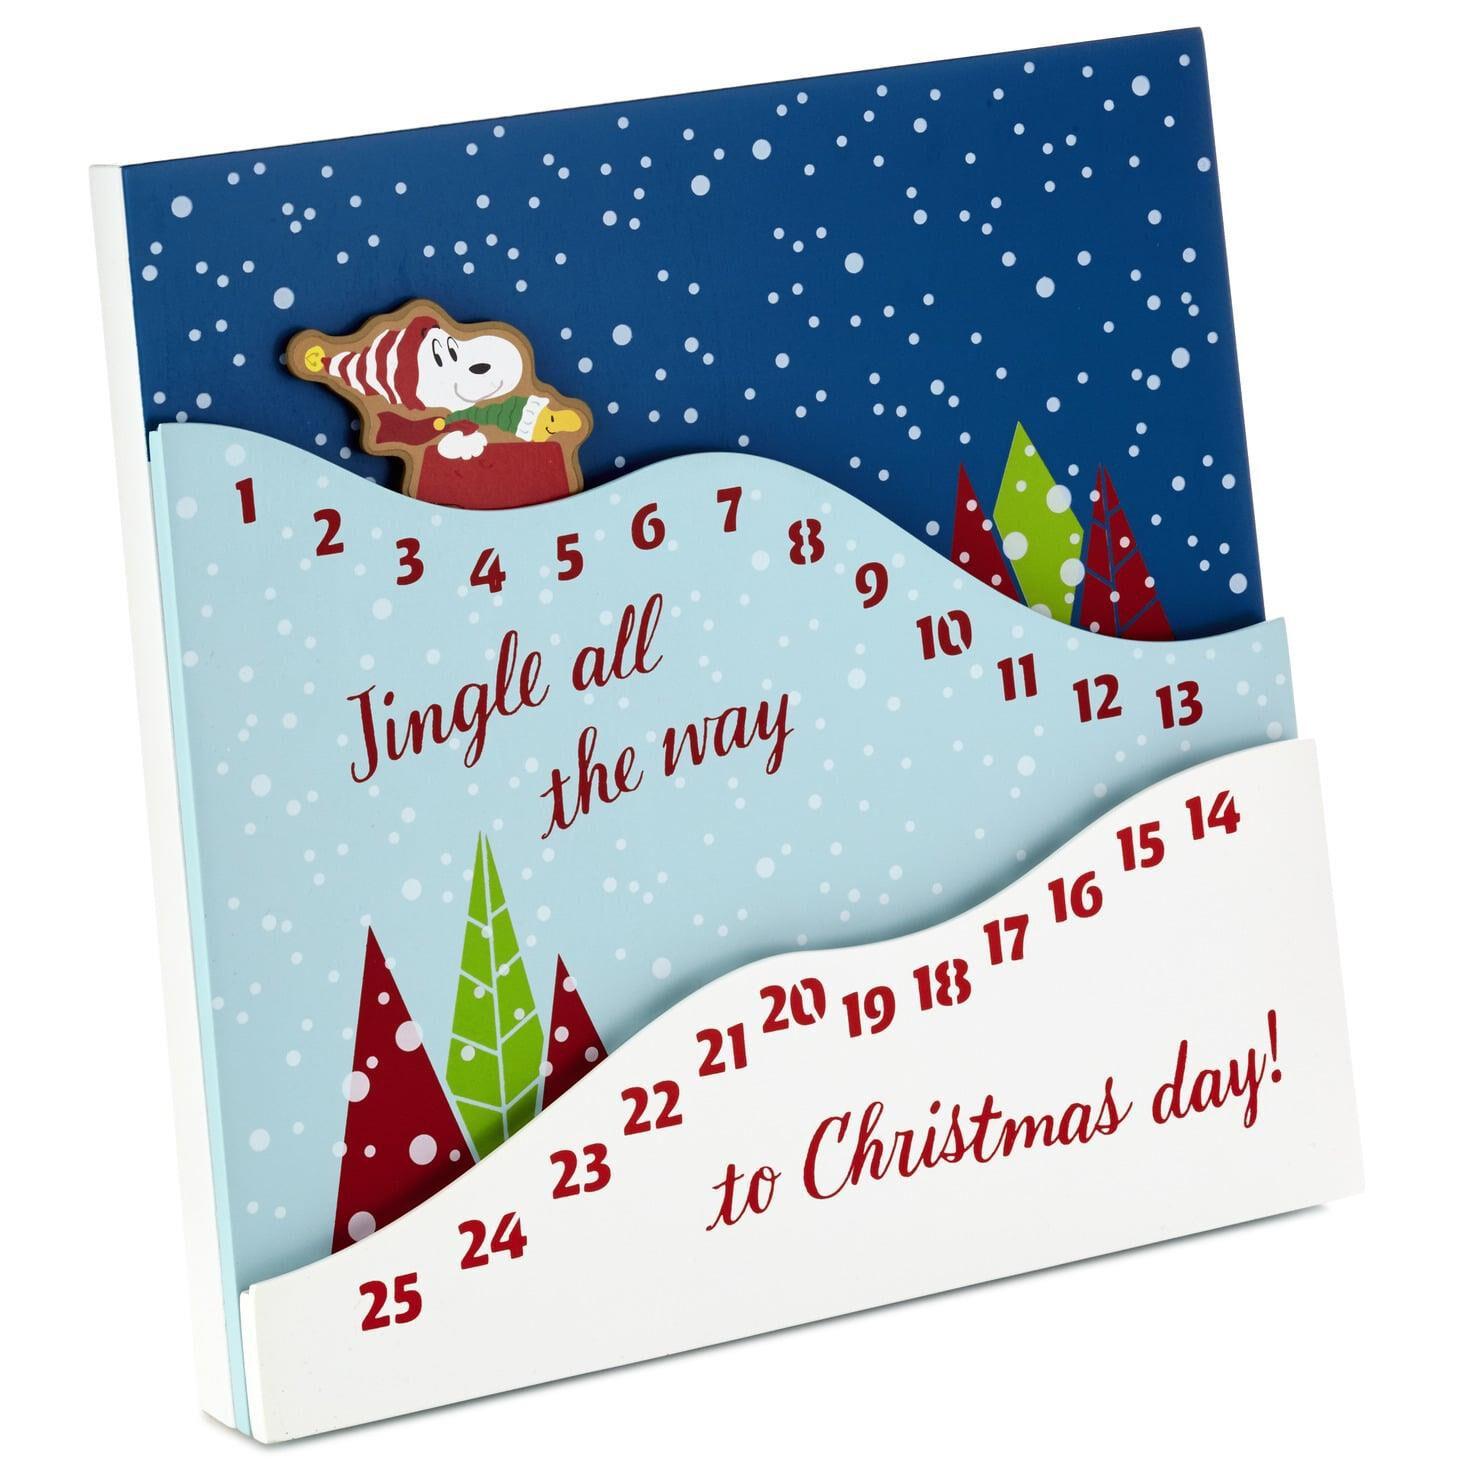 Christmas Countdown.Peanuts Sledding Snoopy Christmas Countdown Calendar Wood Sign 12x12